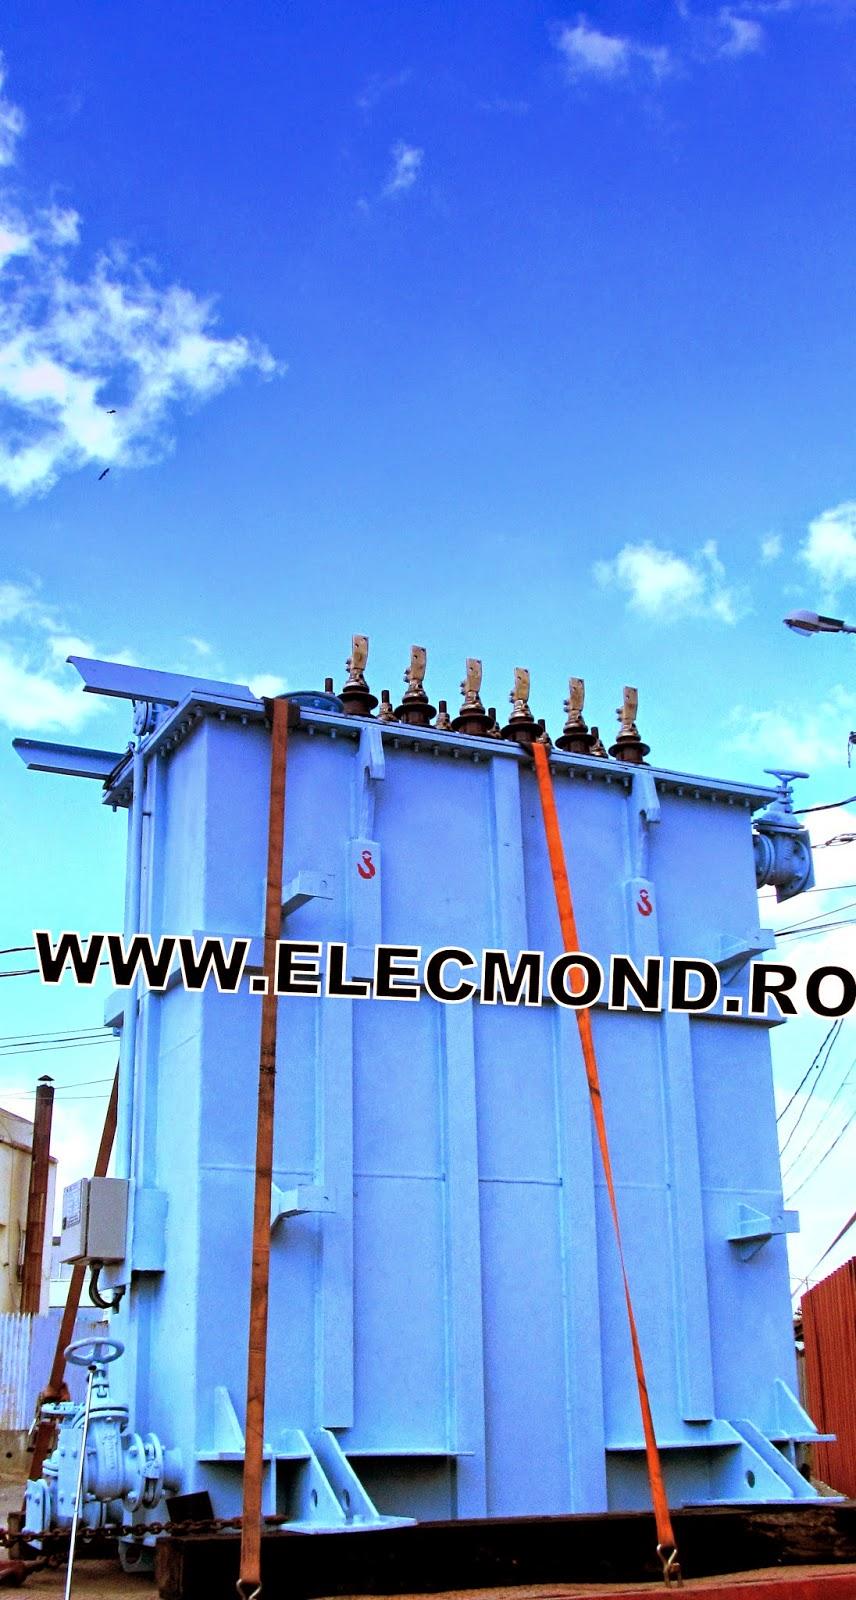 Transformator TTU-Cu- OFAF 9150 kVA 6/0,785 / 0,746/0,707 kV , baterie racire transformator , reparatii transformatoare , transformator de mare putere , transformatoare de putere, elecmond , trafo , transformatoare craiova , transformatoare carcea , transformatoare bucuresti , transformatoare satu mare , transformatoare bucuresti , transformatoare iasi, transformatoare calarasi , transformatoare constanta , elecmond  ,